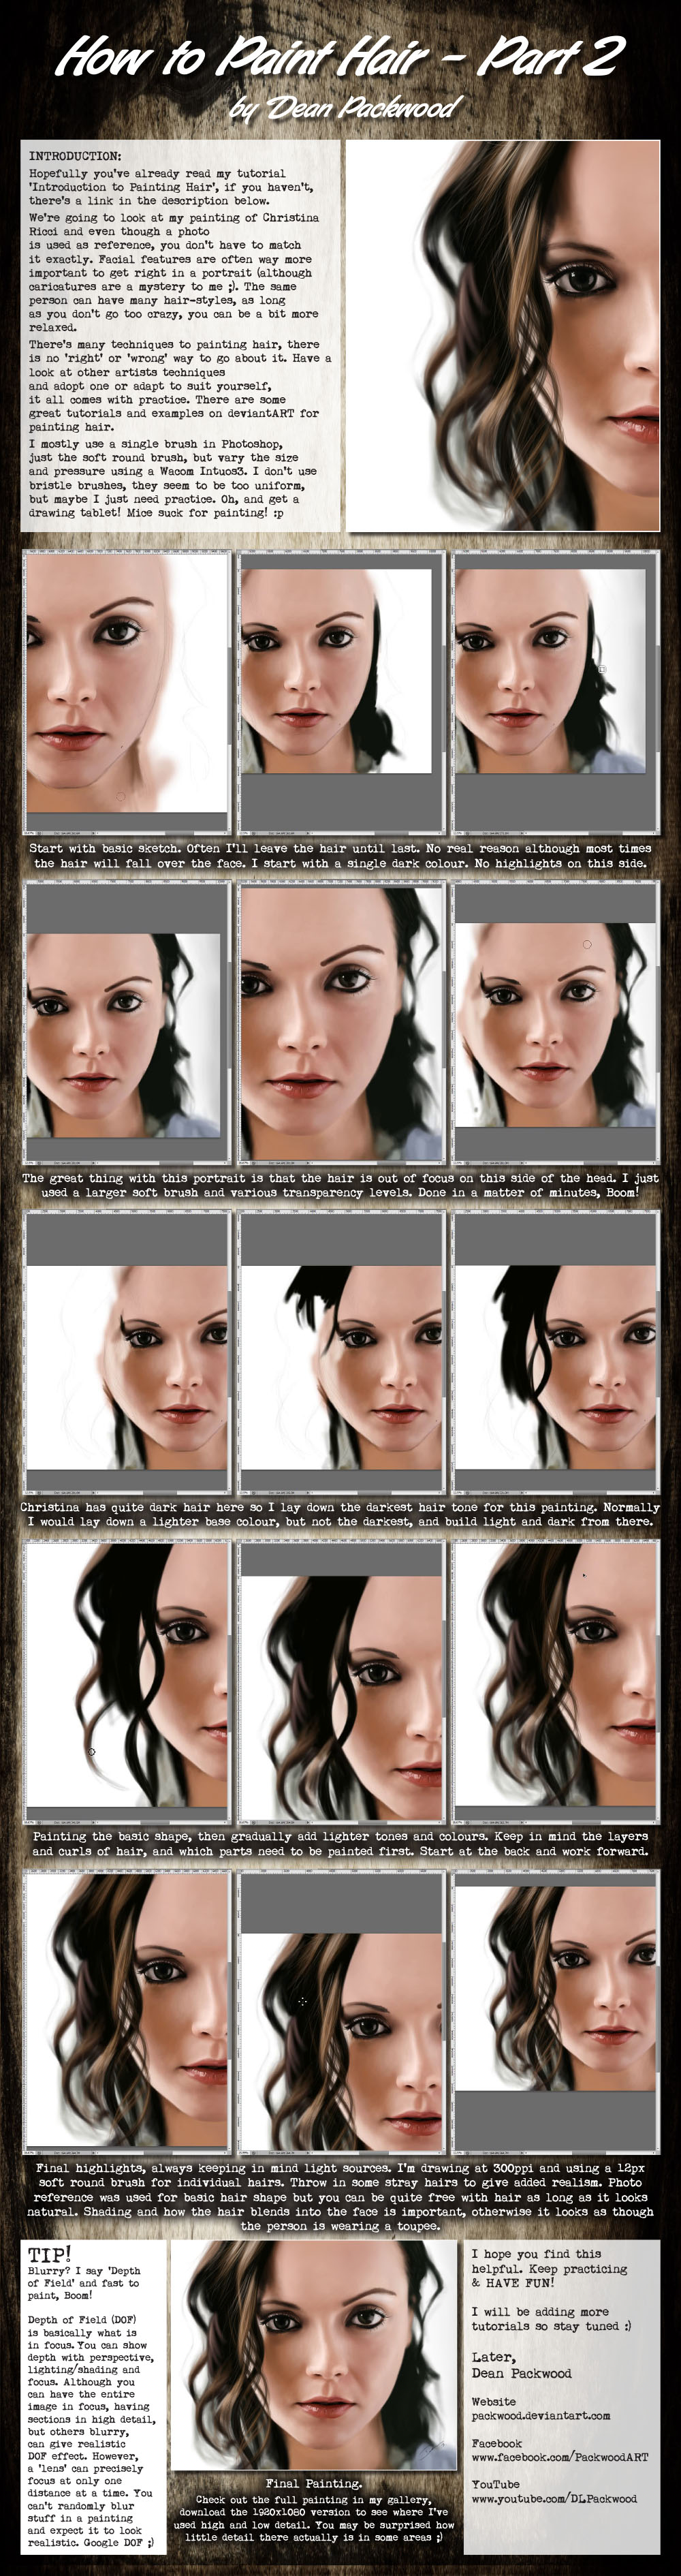 Hair tutorial part 2 by packwood on deviantart hair tutorial part 2 by packwood baditri Image collections